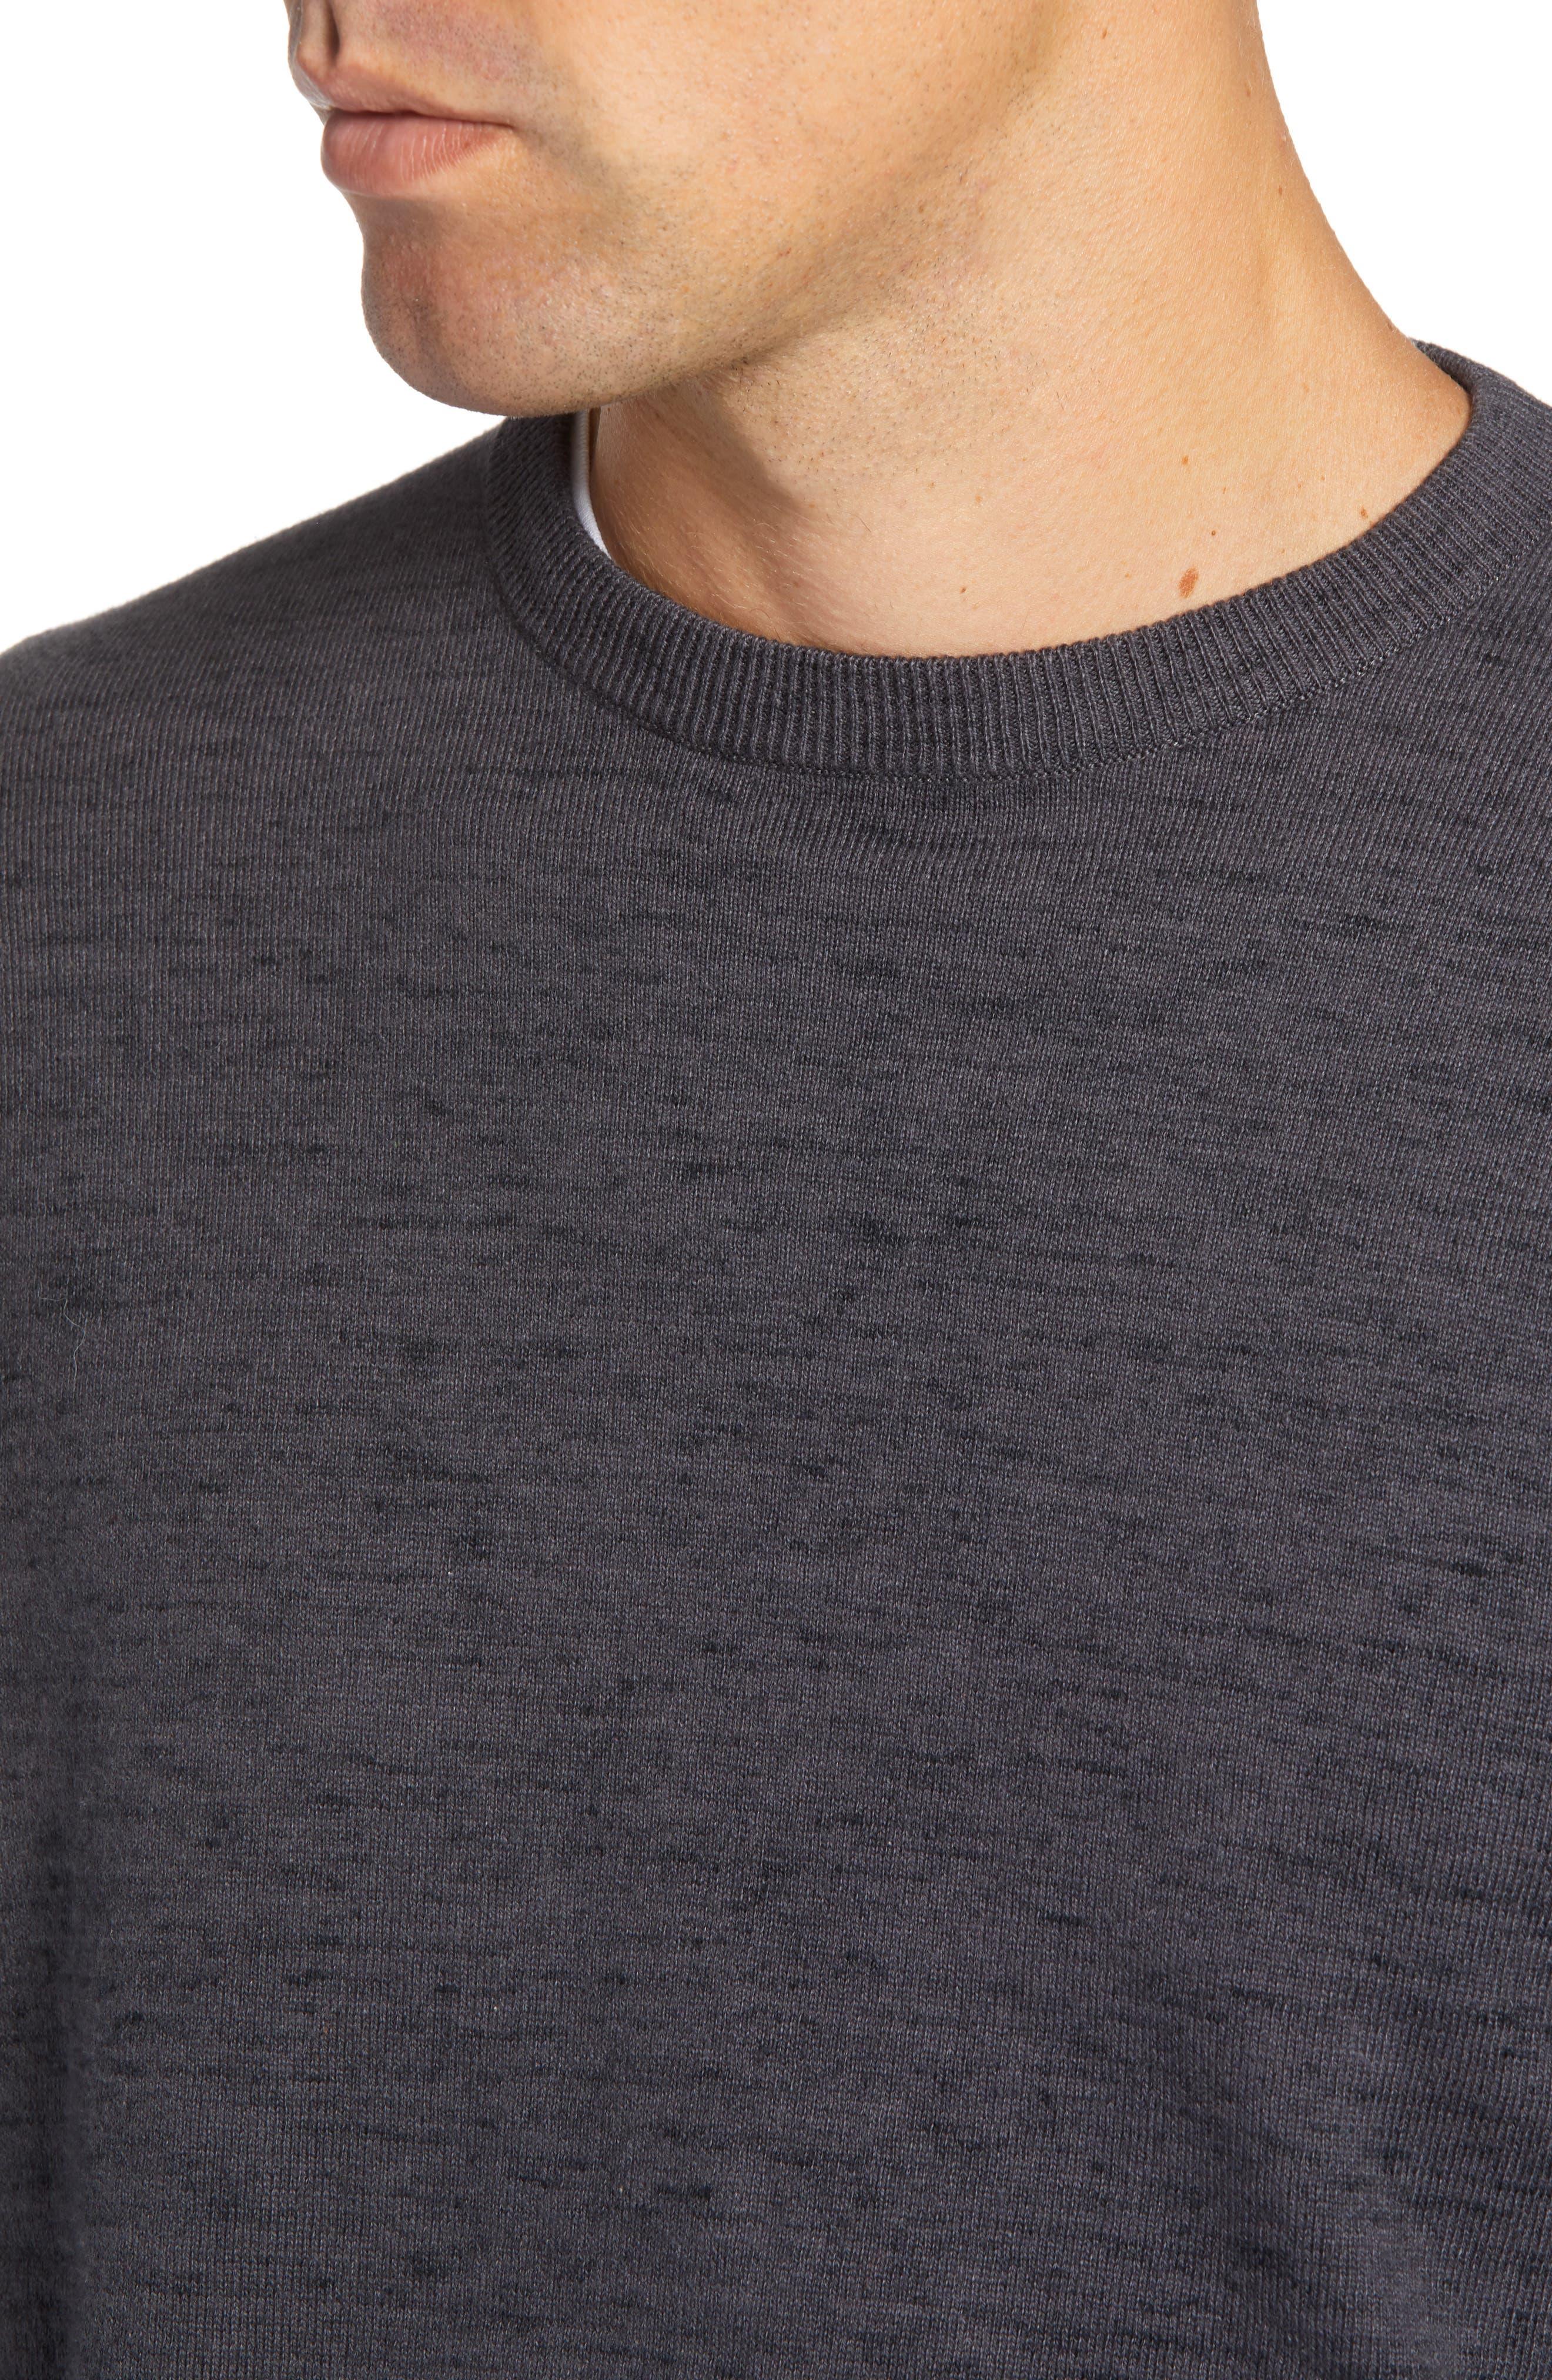 Regular Fit Crewneck Sweater,                             Alternate thumbnail 4, color,                             GREY DARK CHARCOAL HEATHER